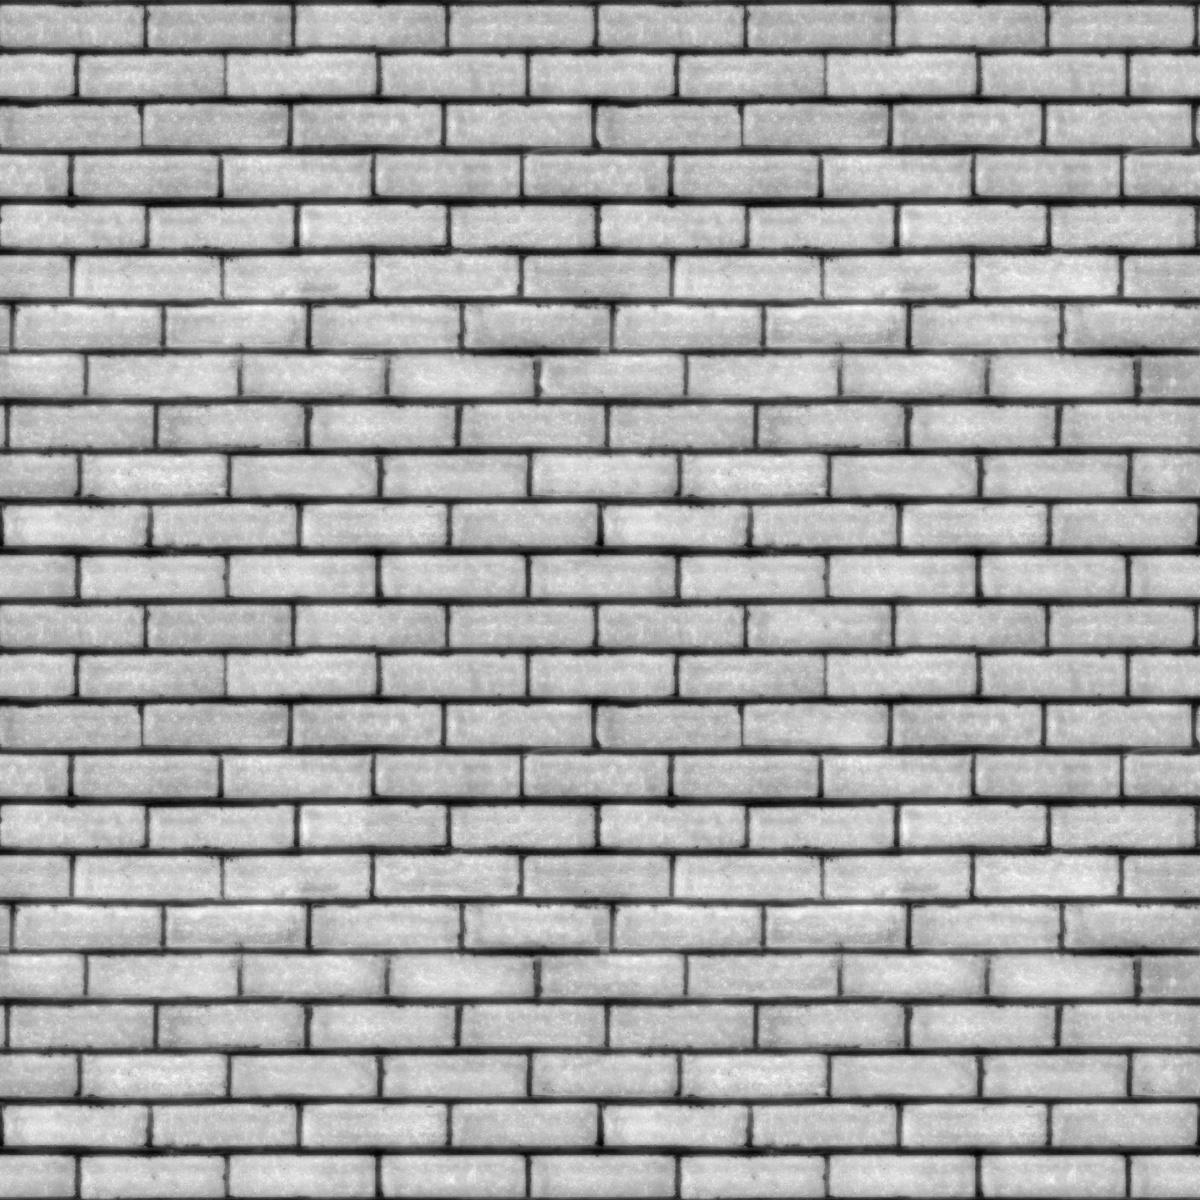 Fireplace 3d Wallpaper Tileable Grey Brick Wall Texture Maps Texturise Free